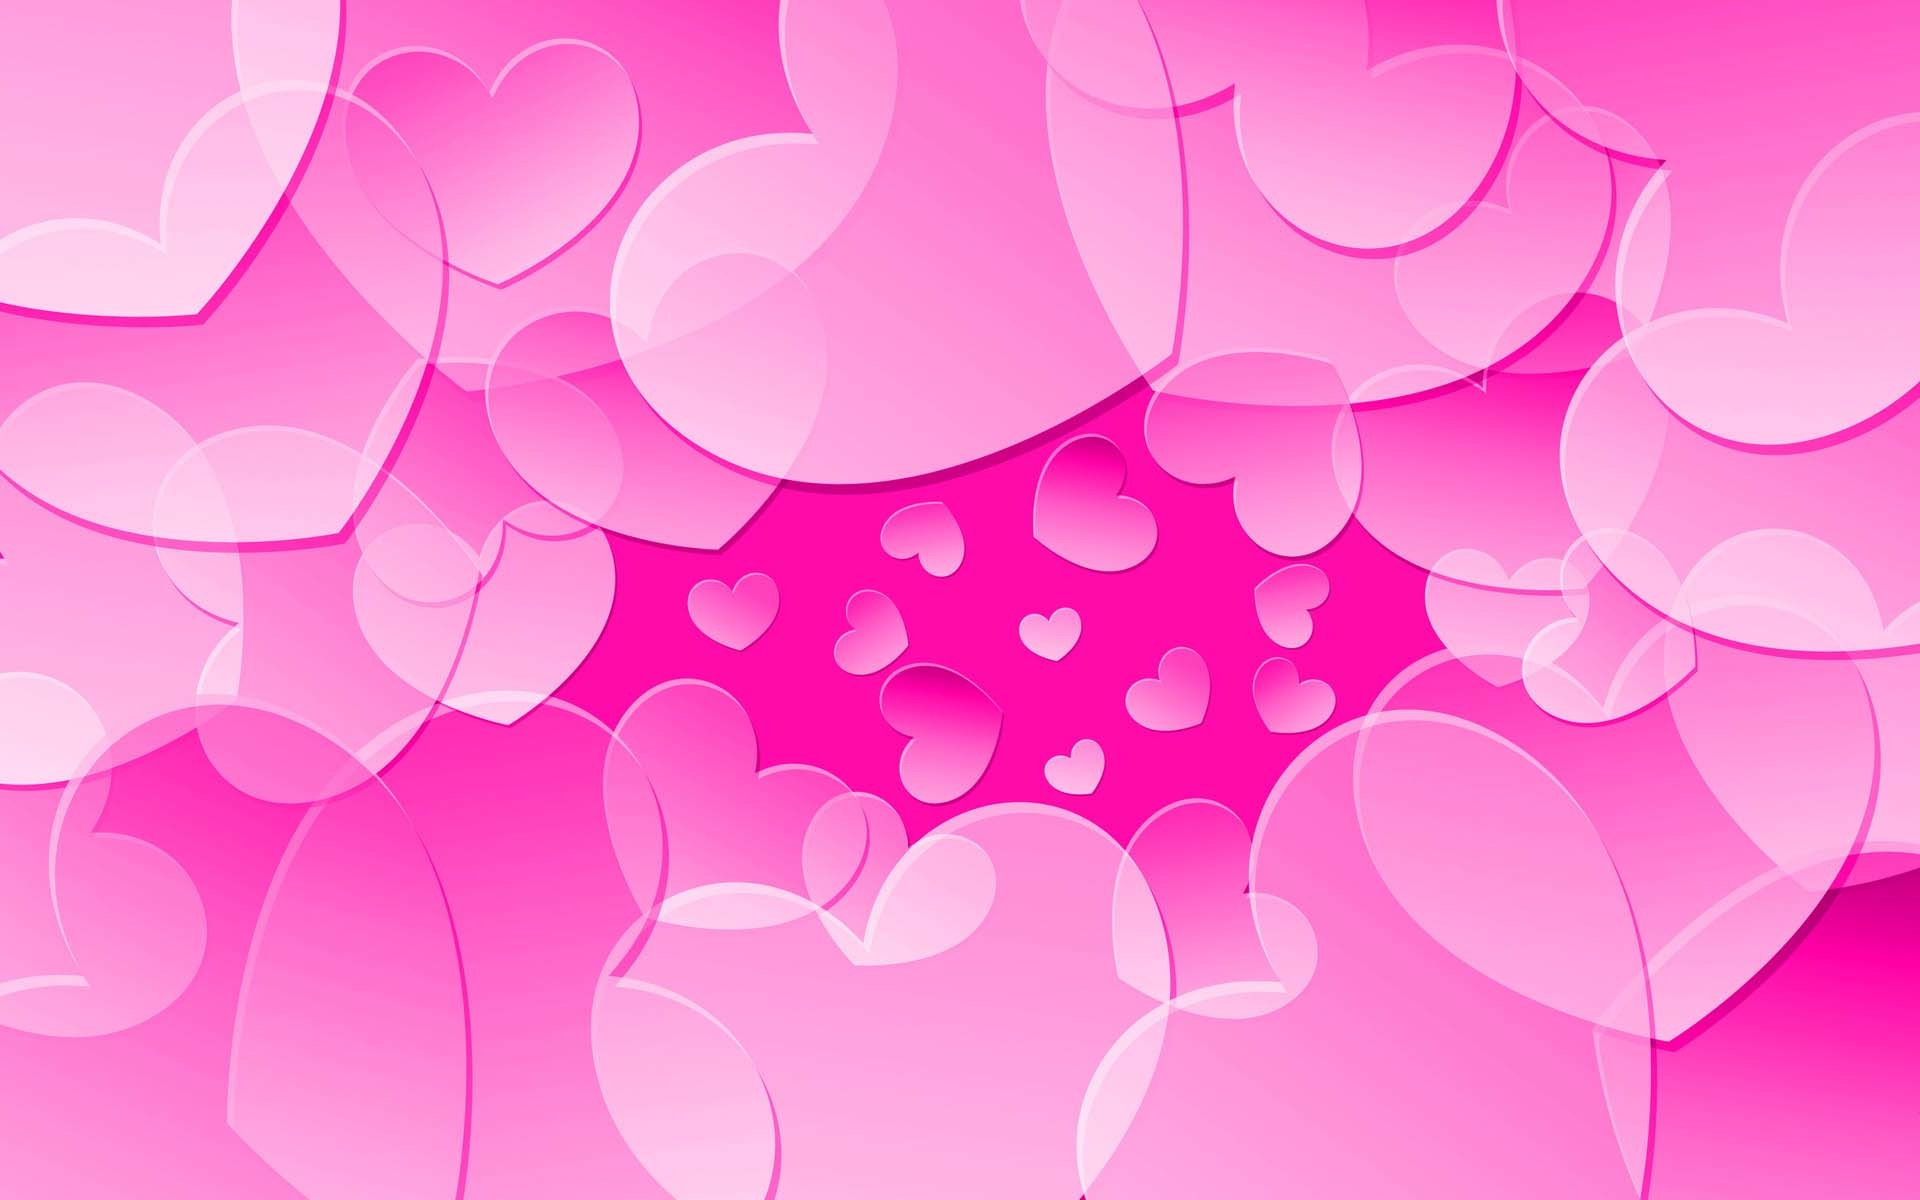 … love wallpaper …